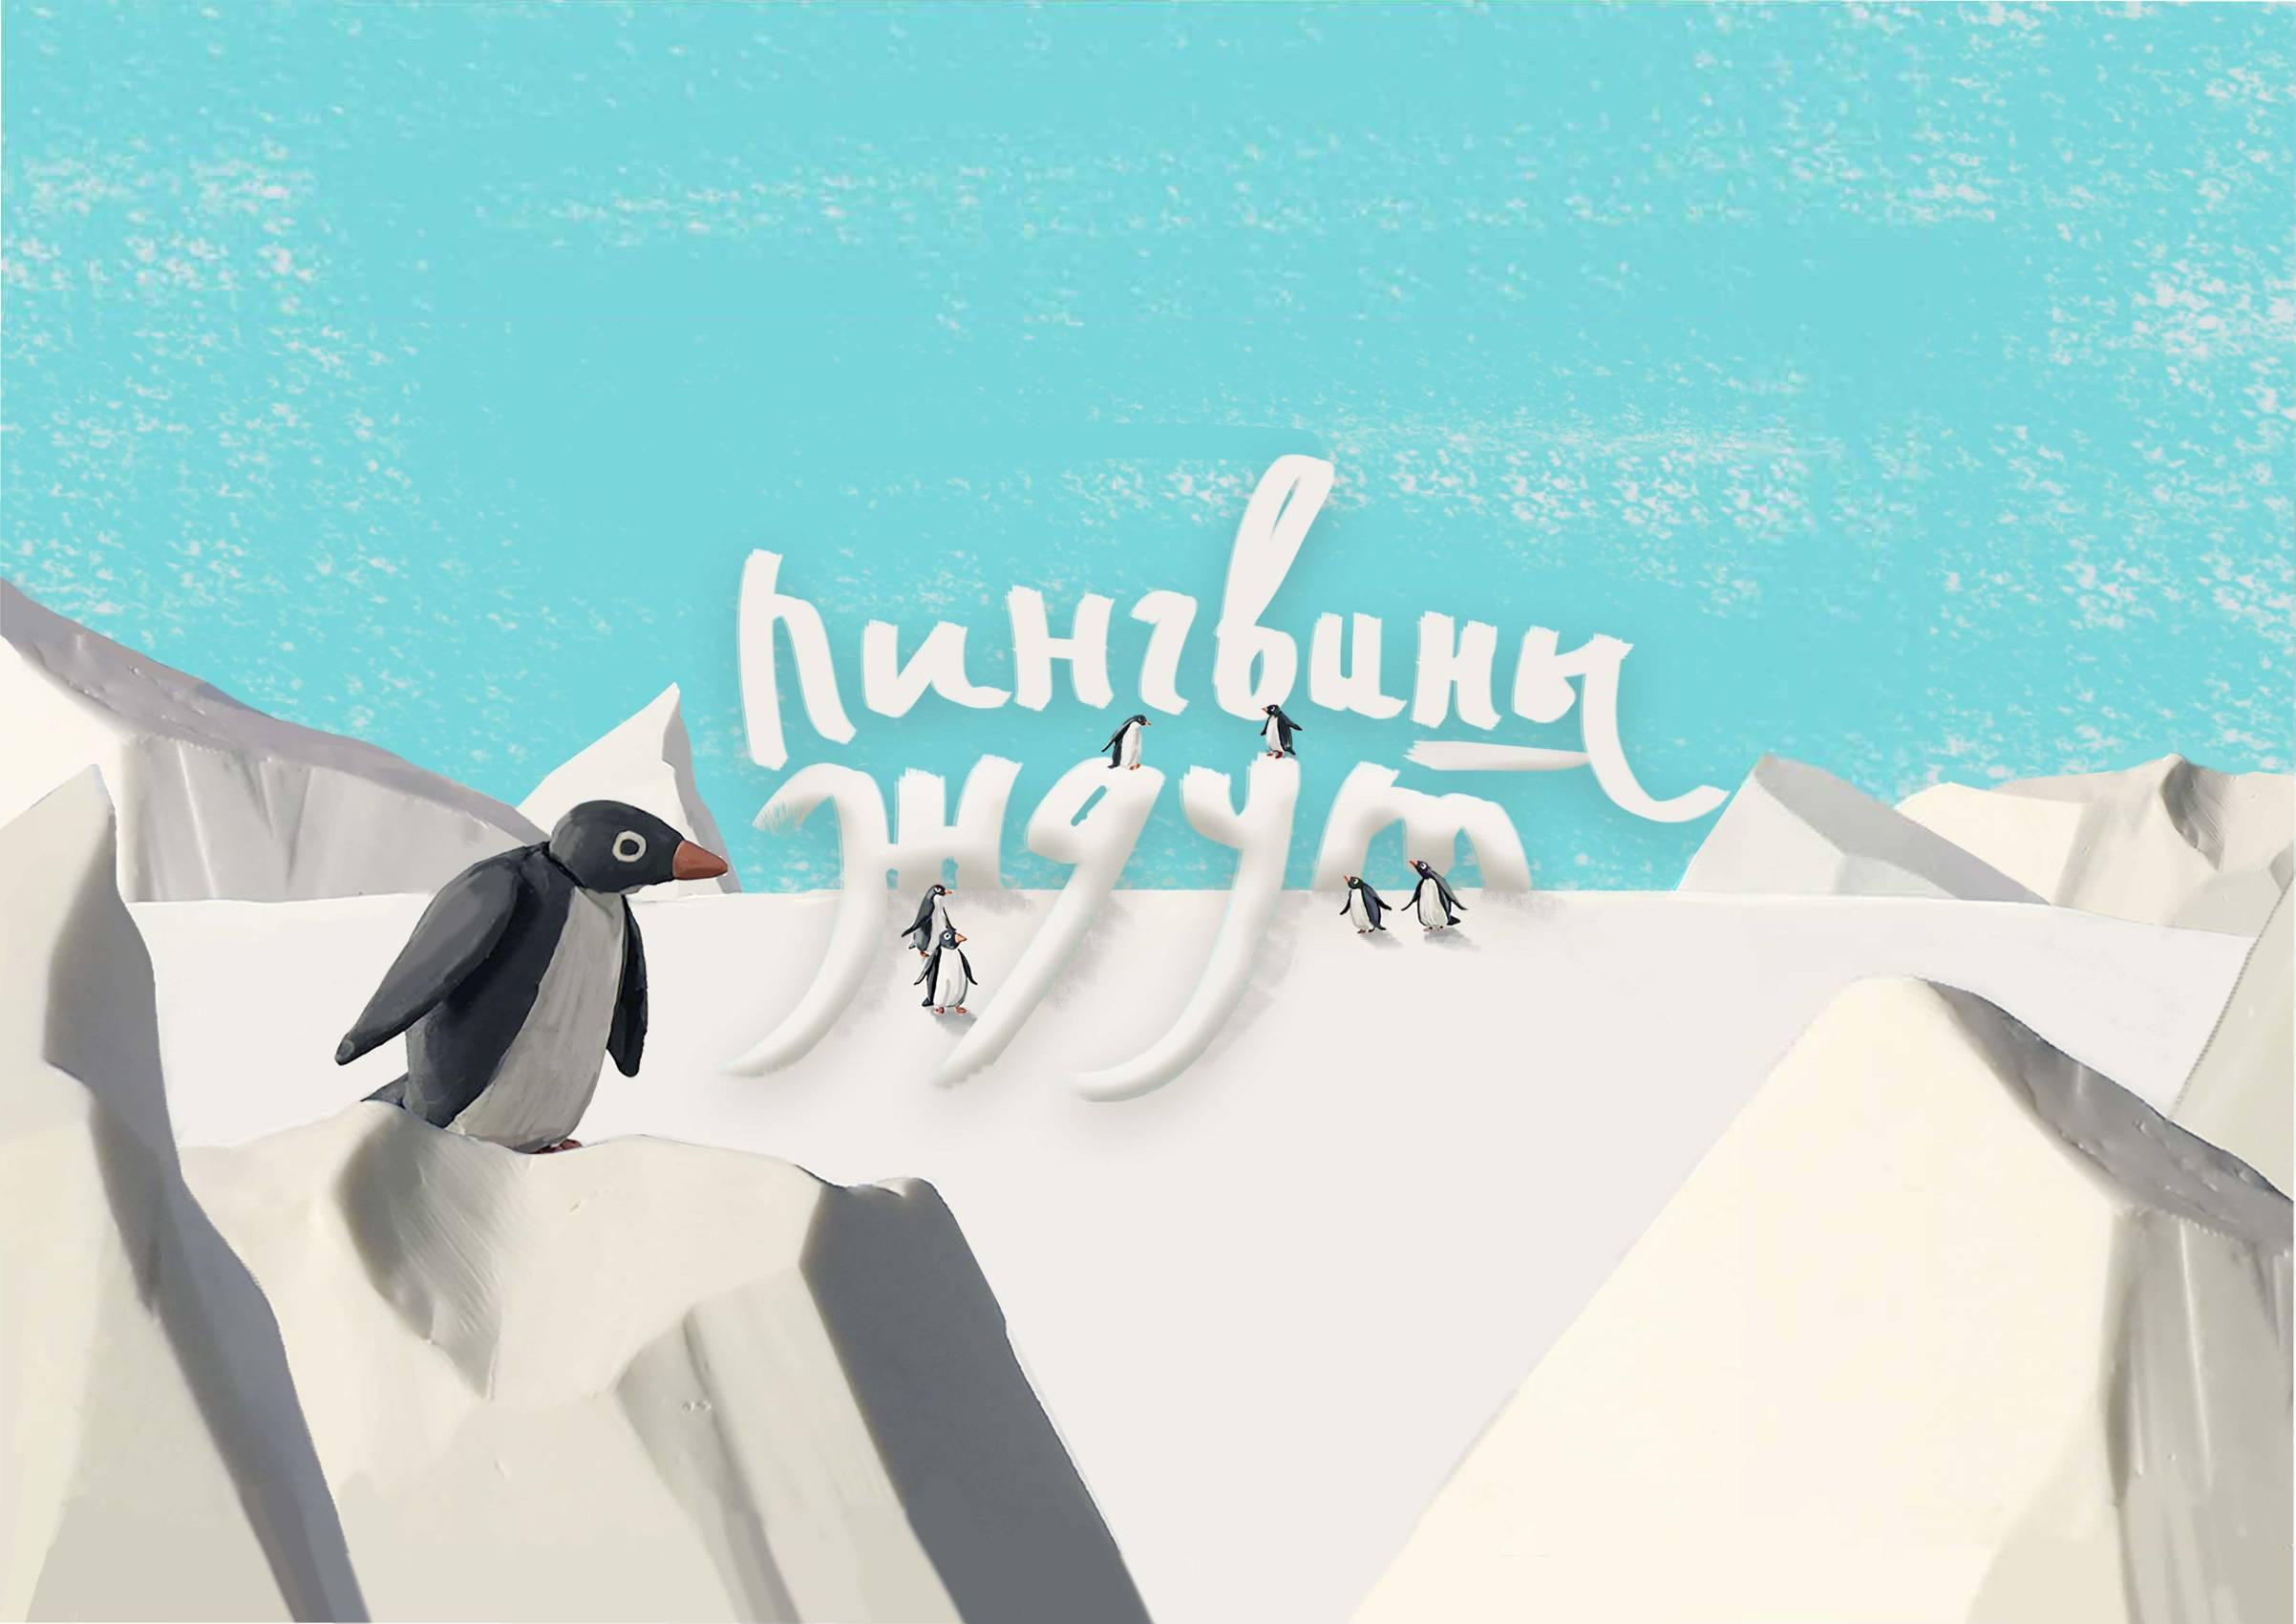 Пингвины ждут